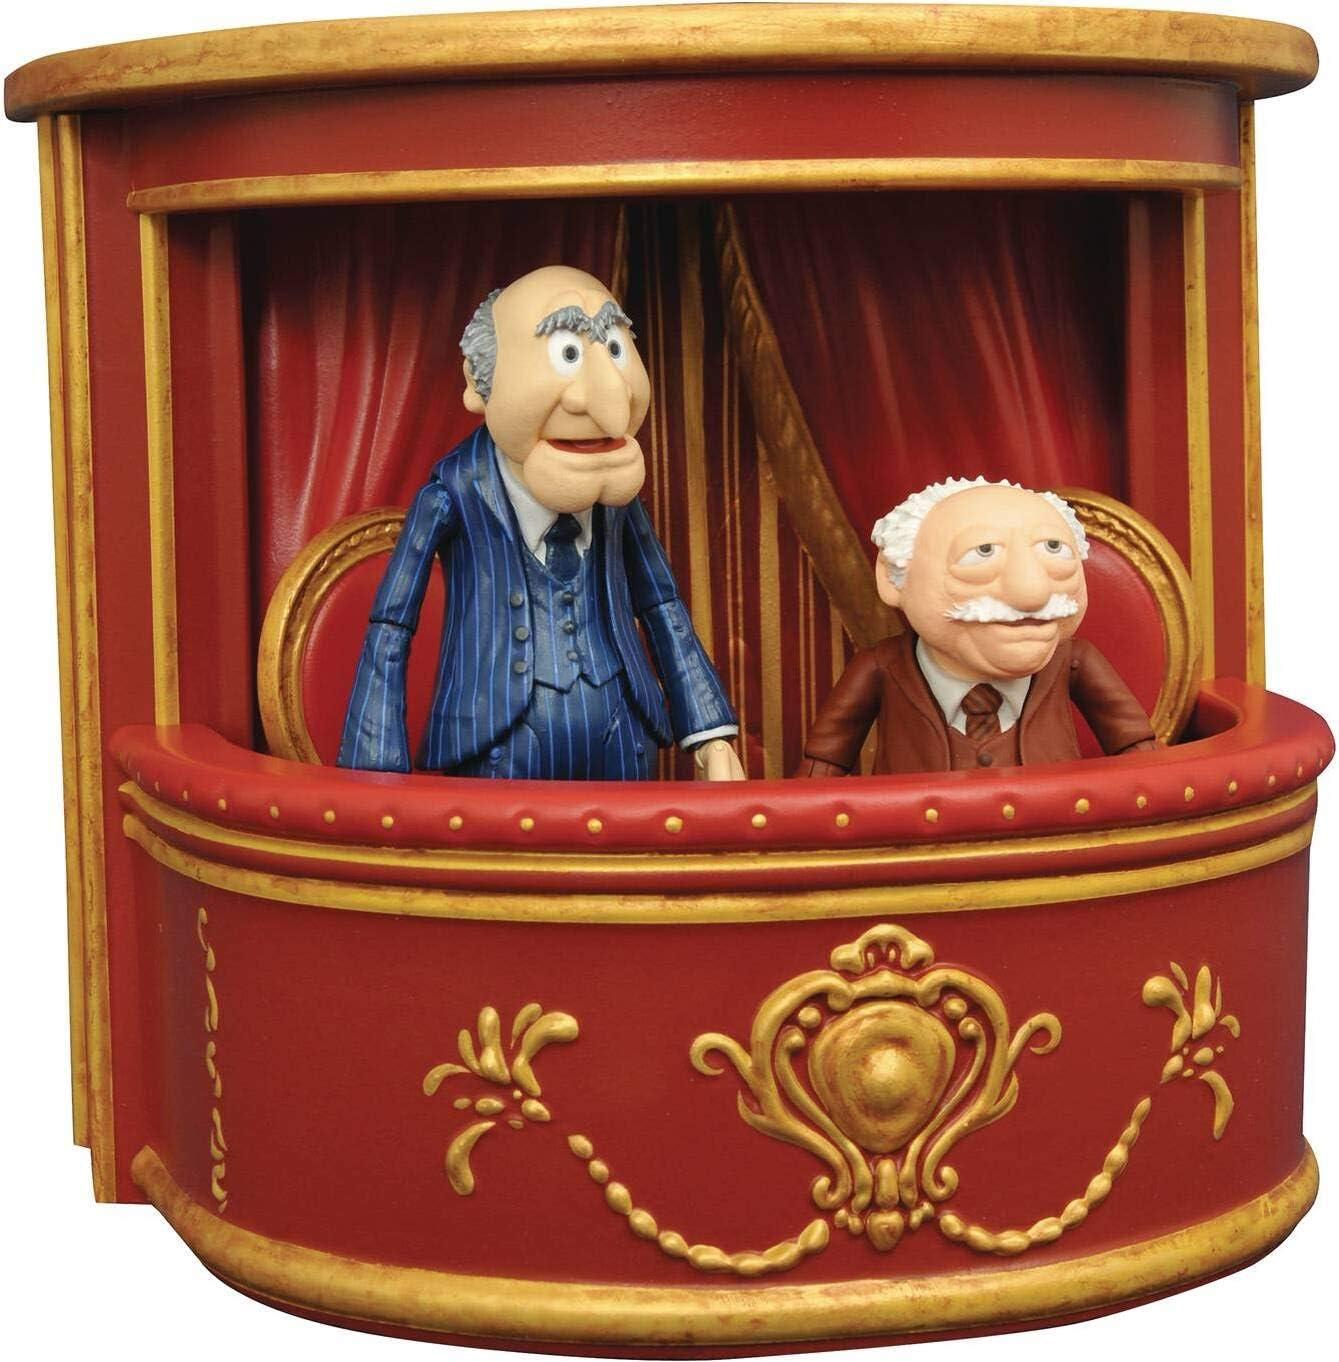 Diamond Select Toys The Muppets: Statler & Waldorf Select Action Figure